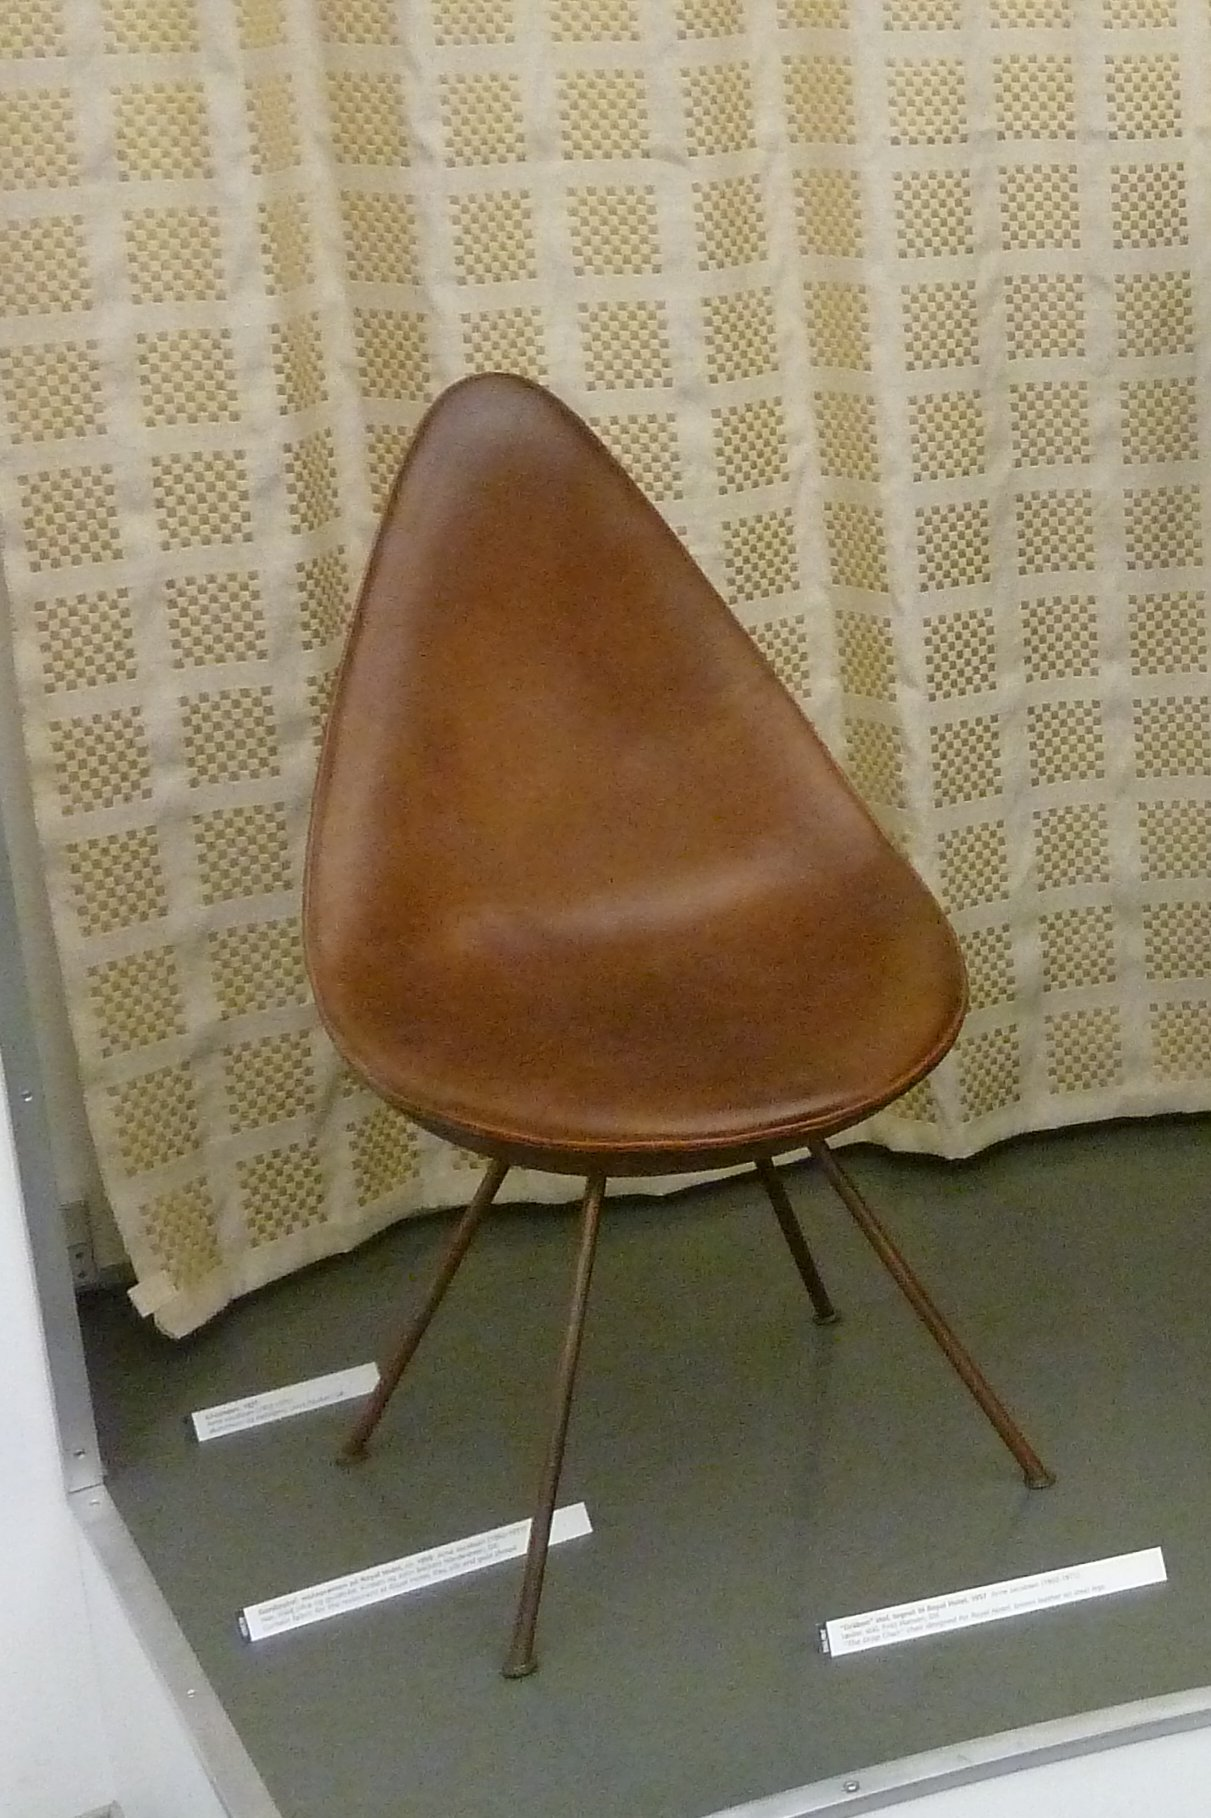 Arne jacobsen drop chair - File The Drop By Arne Jacobsen Jpg